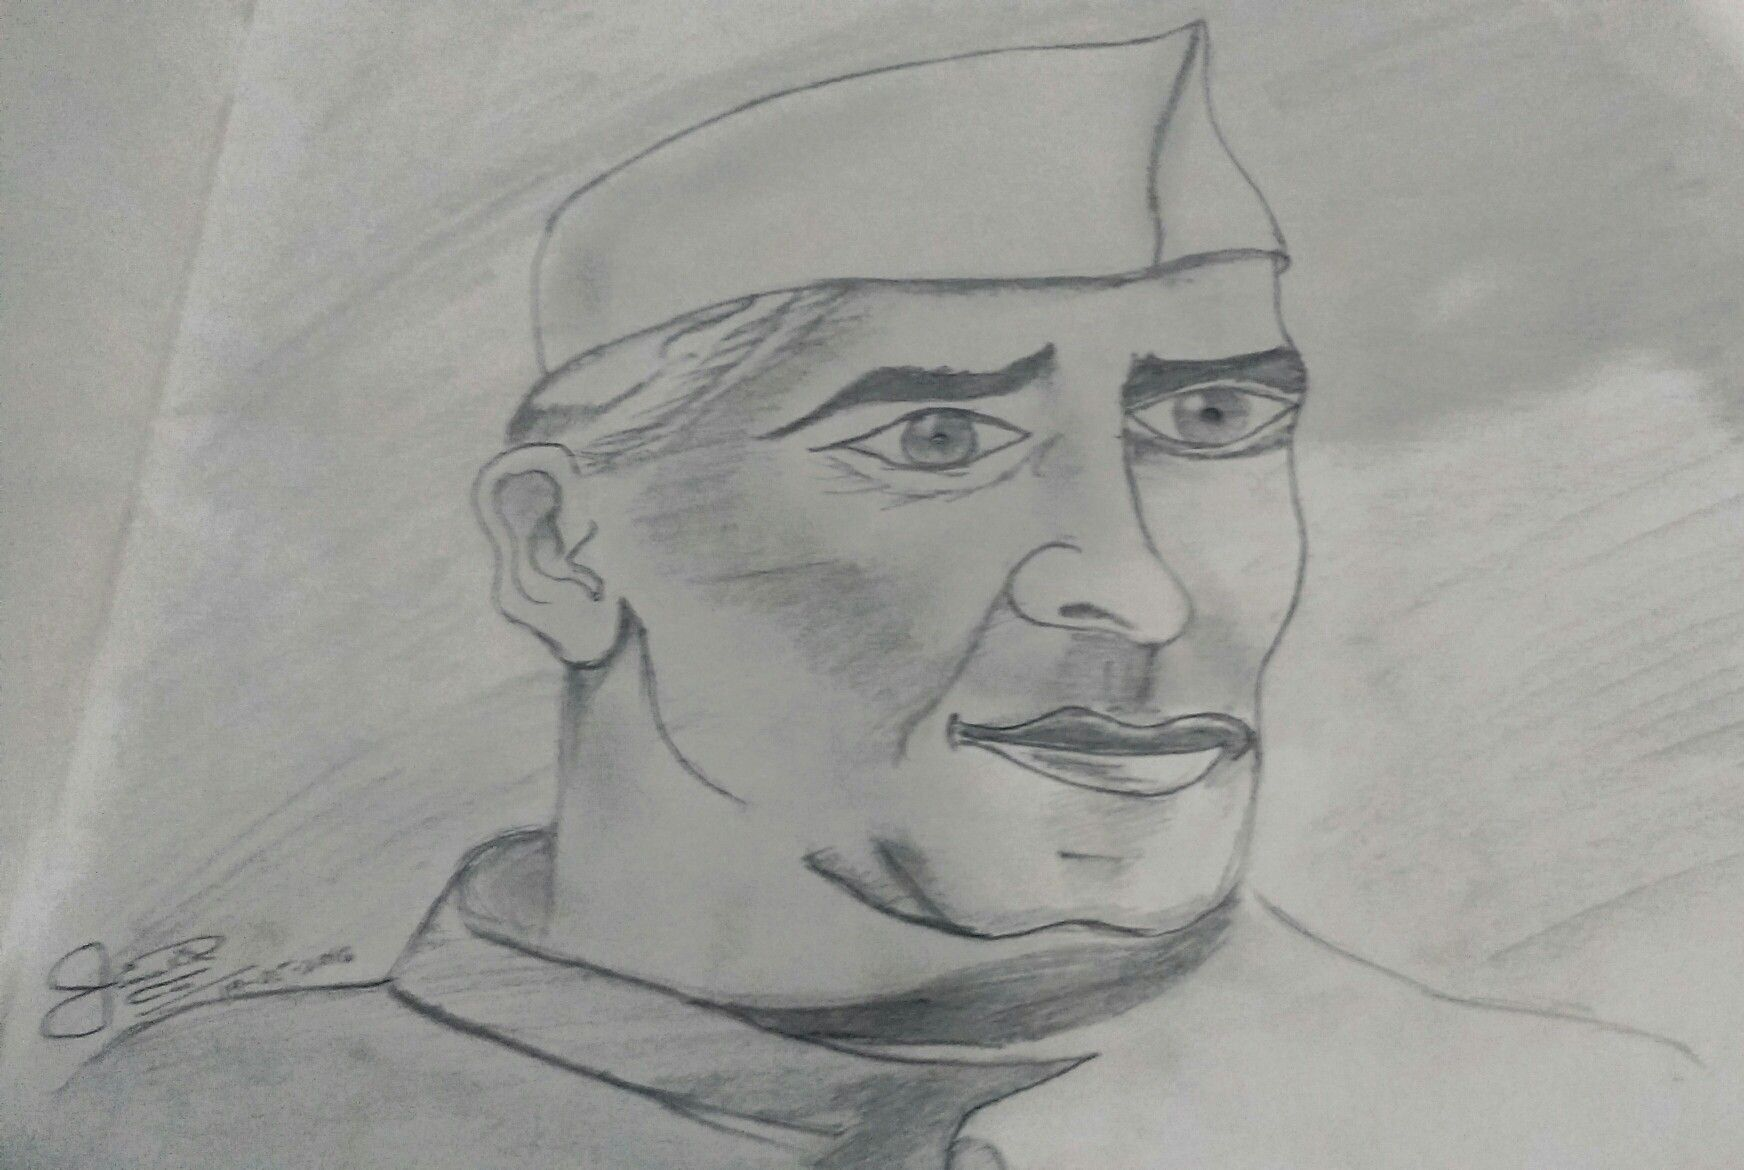 Jawaharlal nehru drawn by himali raichura😊